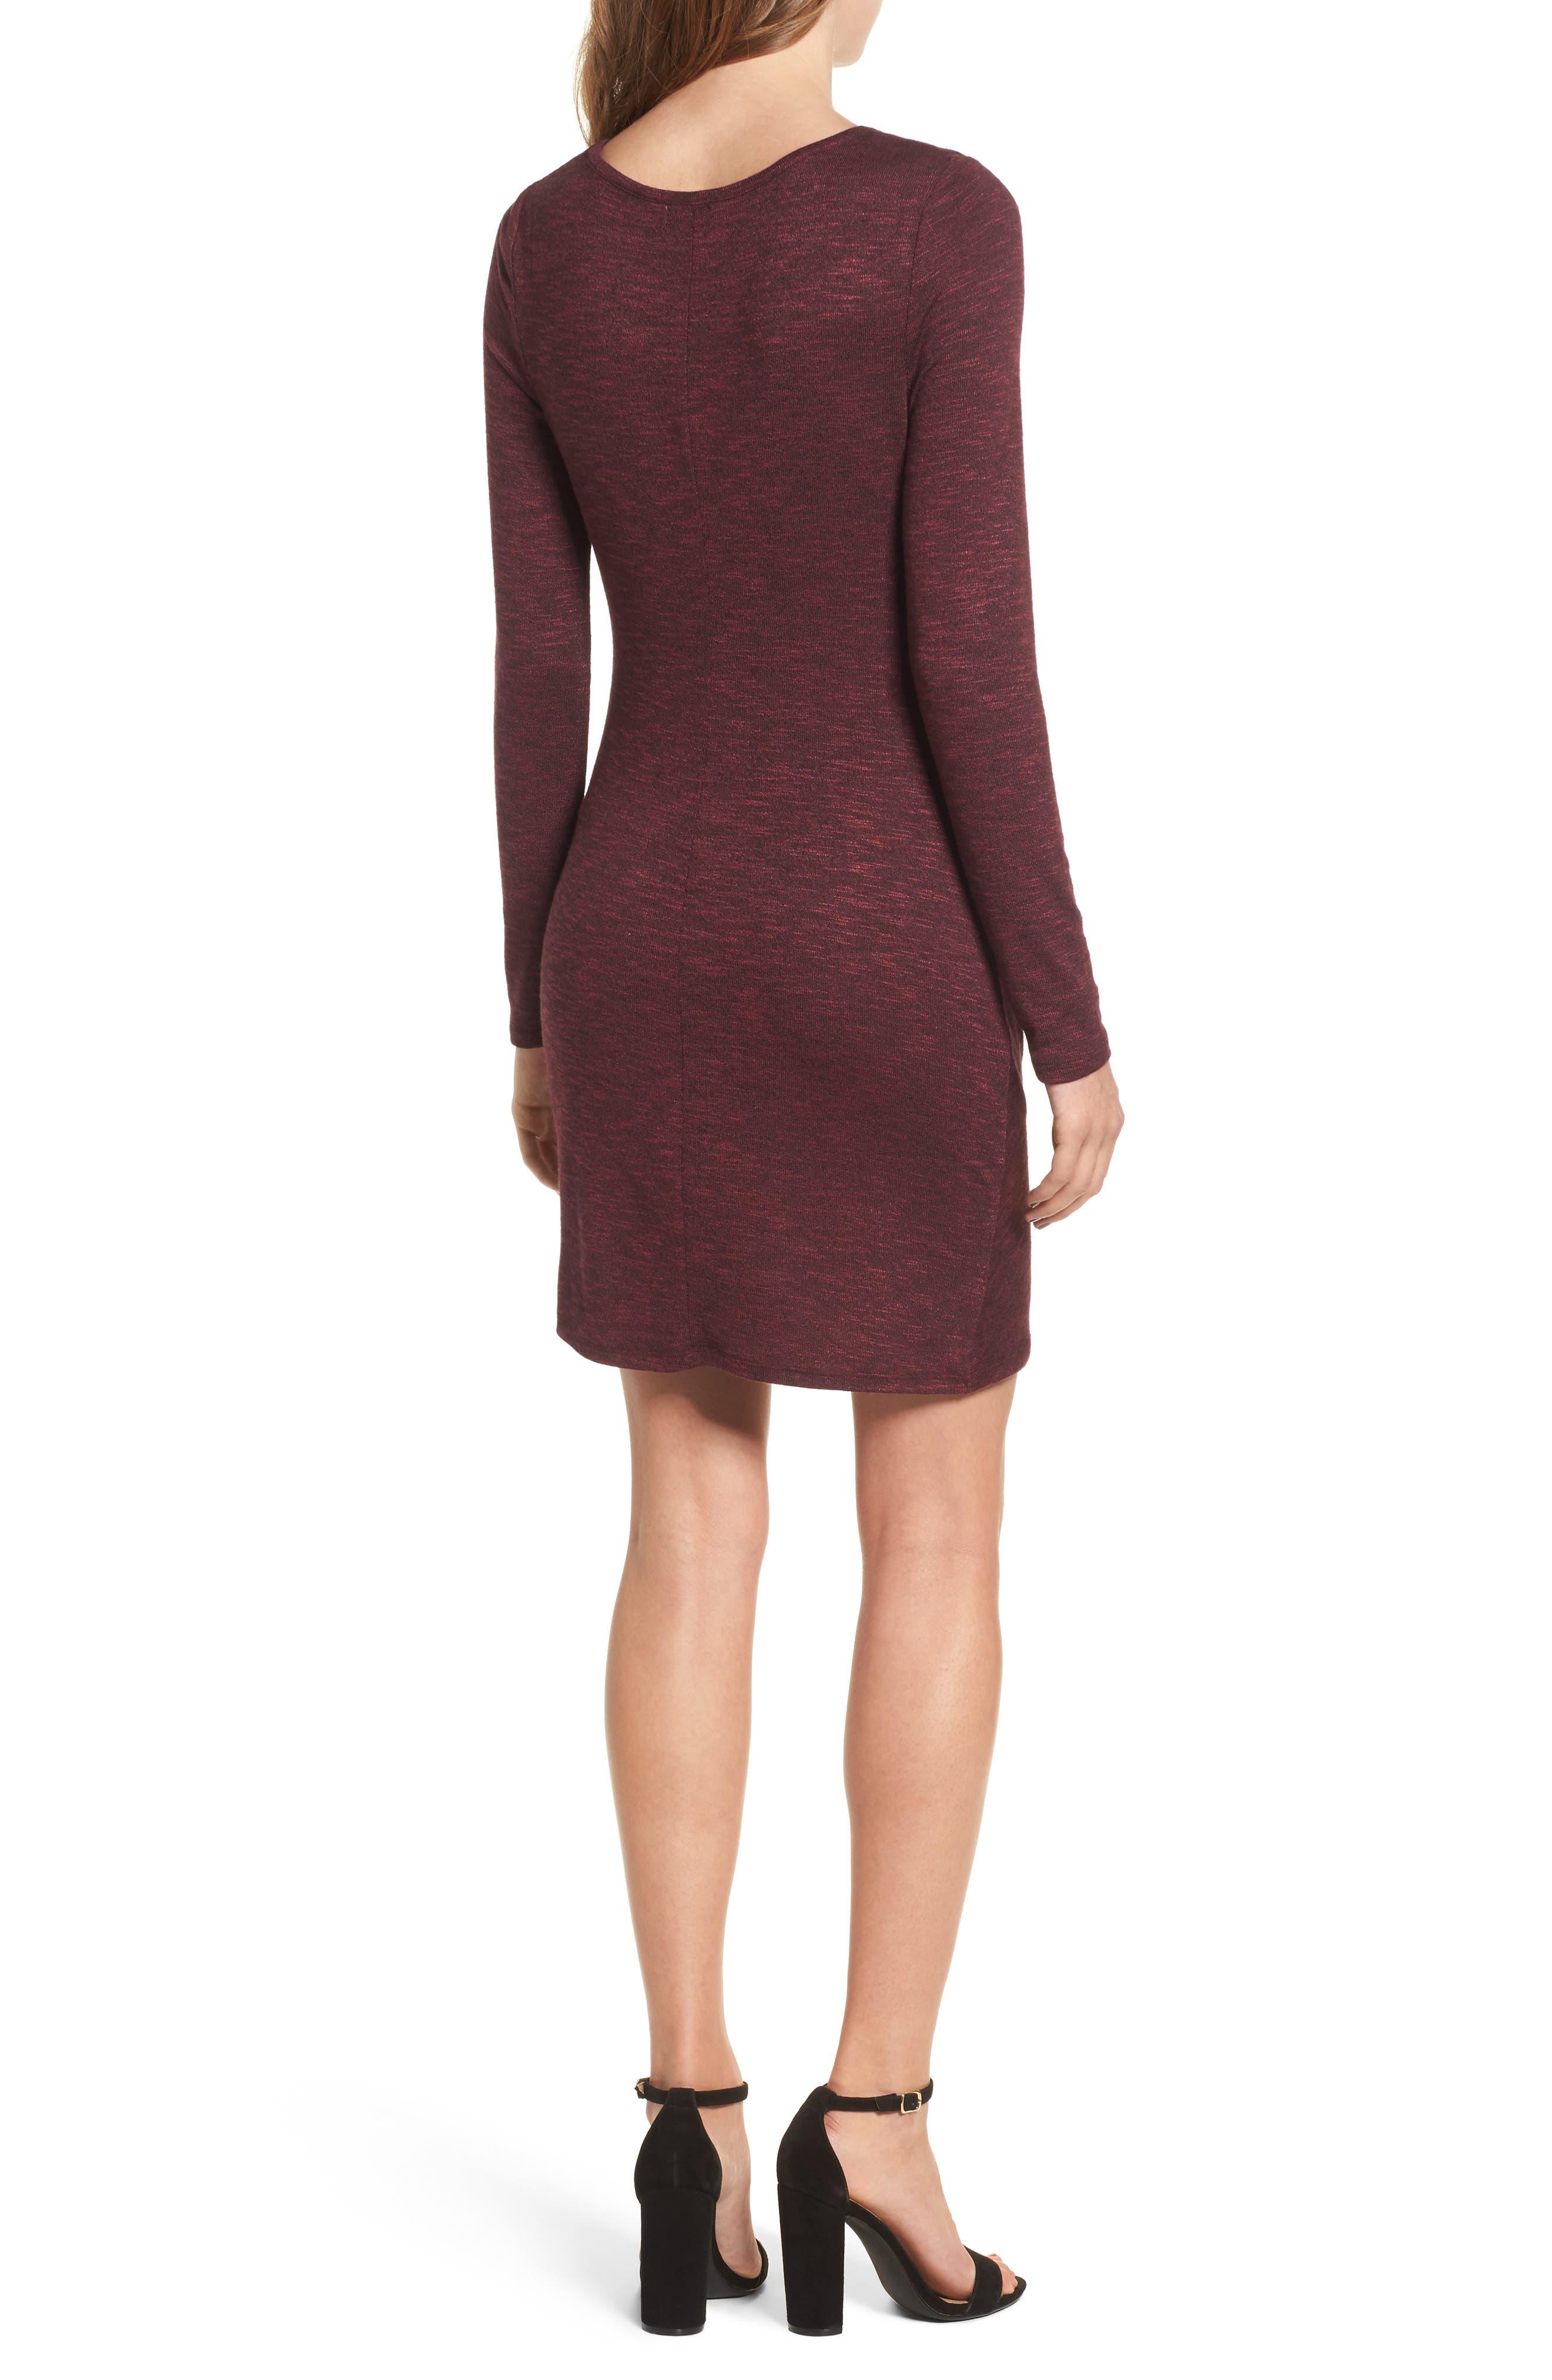 Ruched Knit Dress,                             Alternate thumbnail 2, color,                             Zinfandel